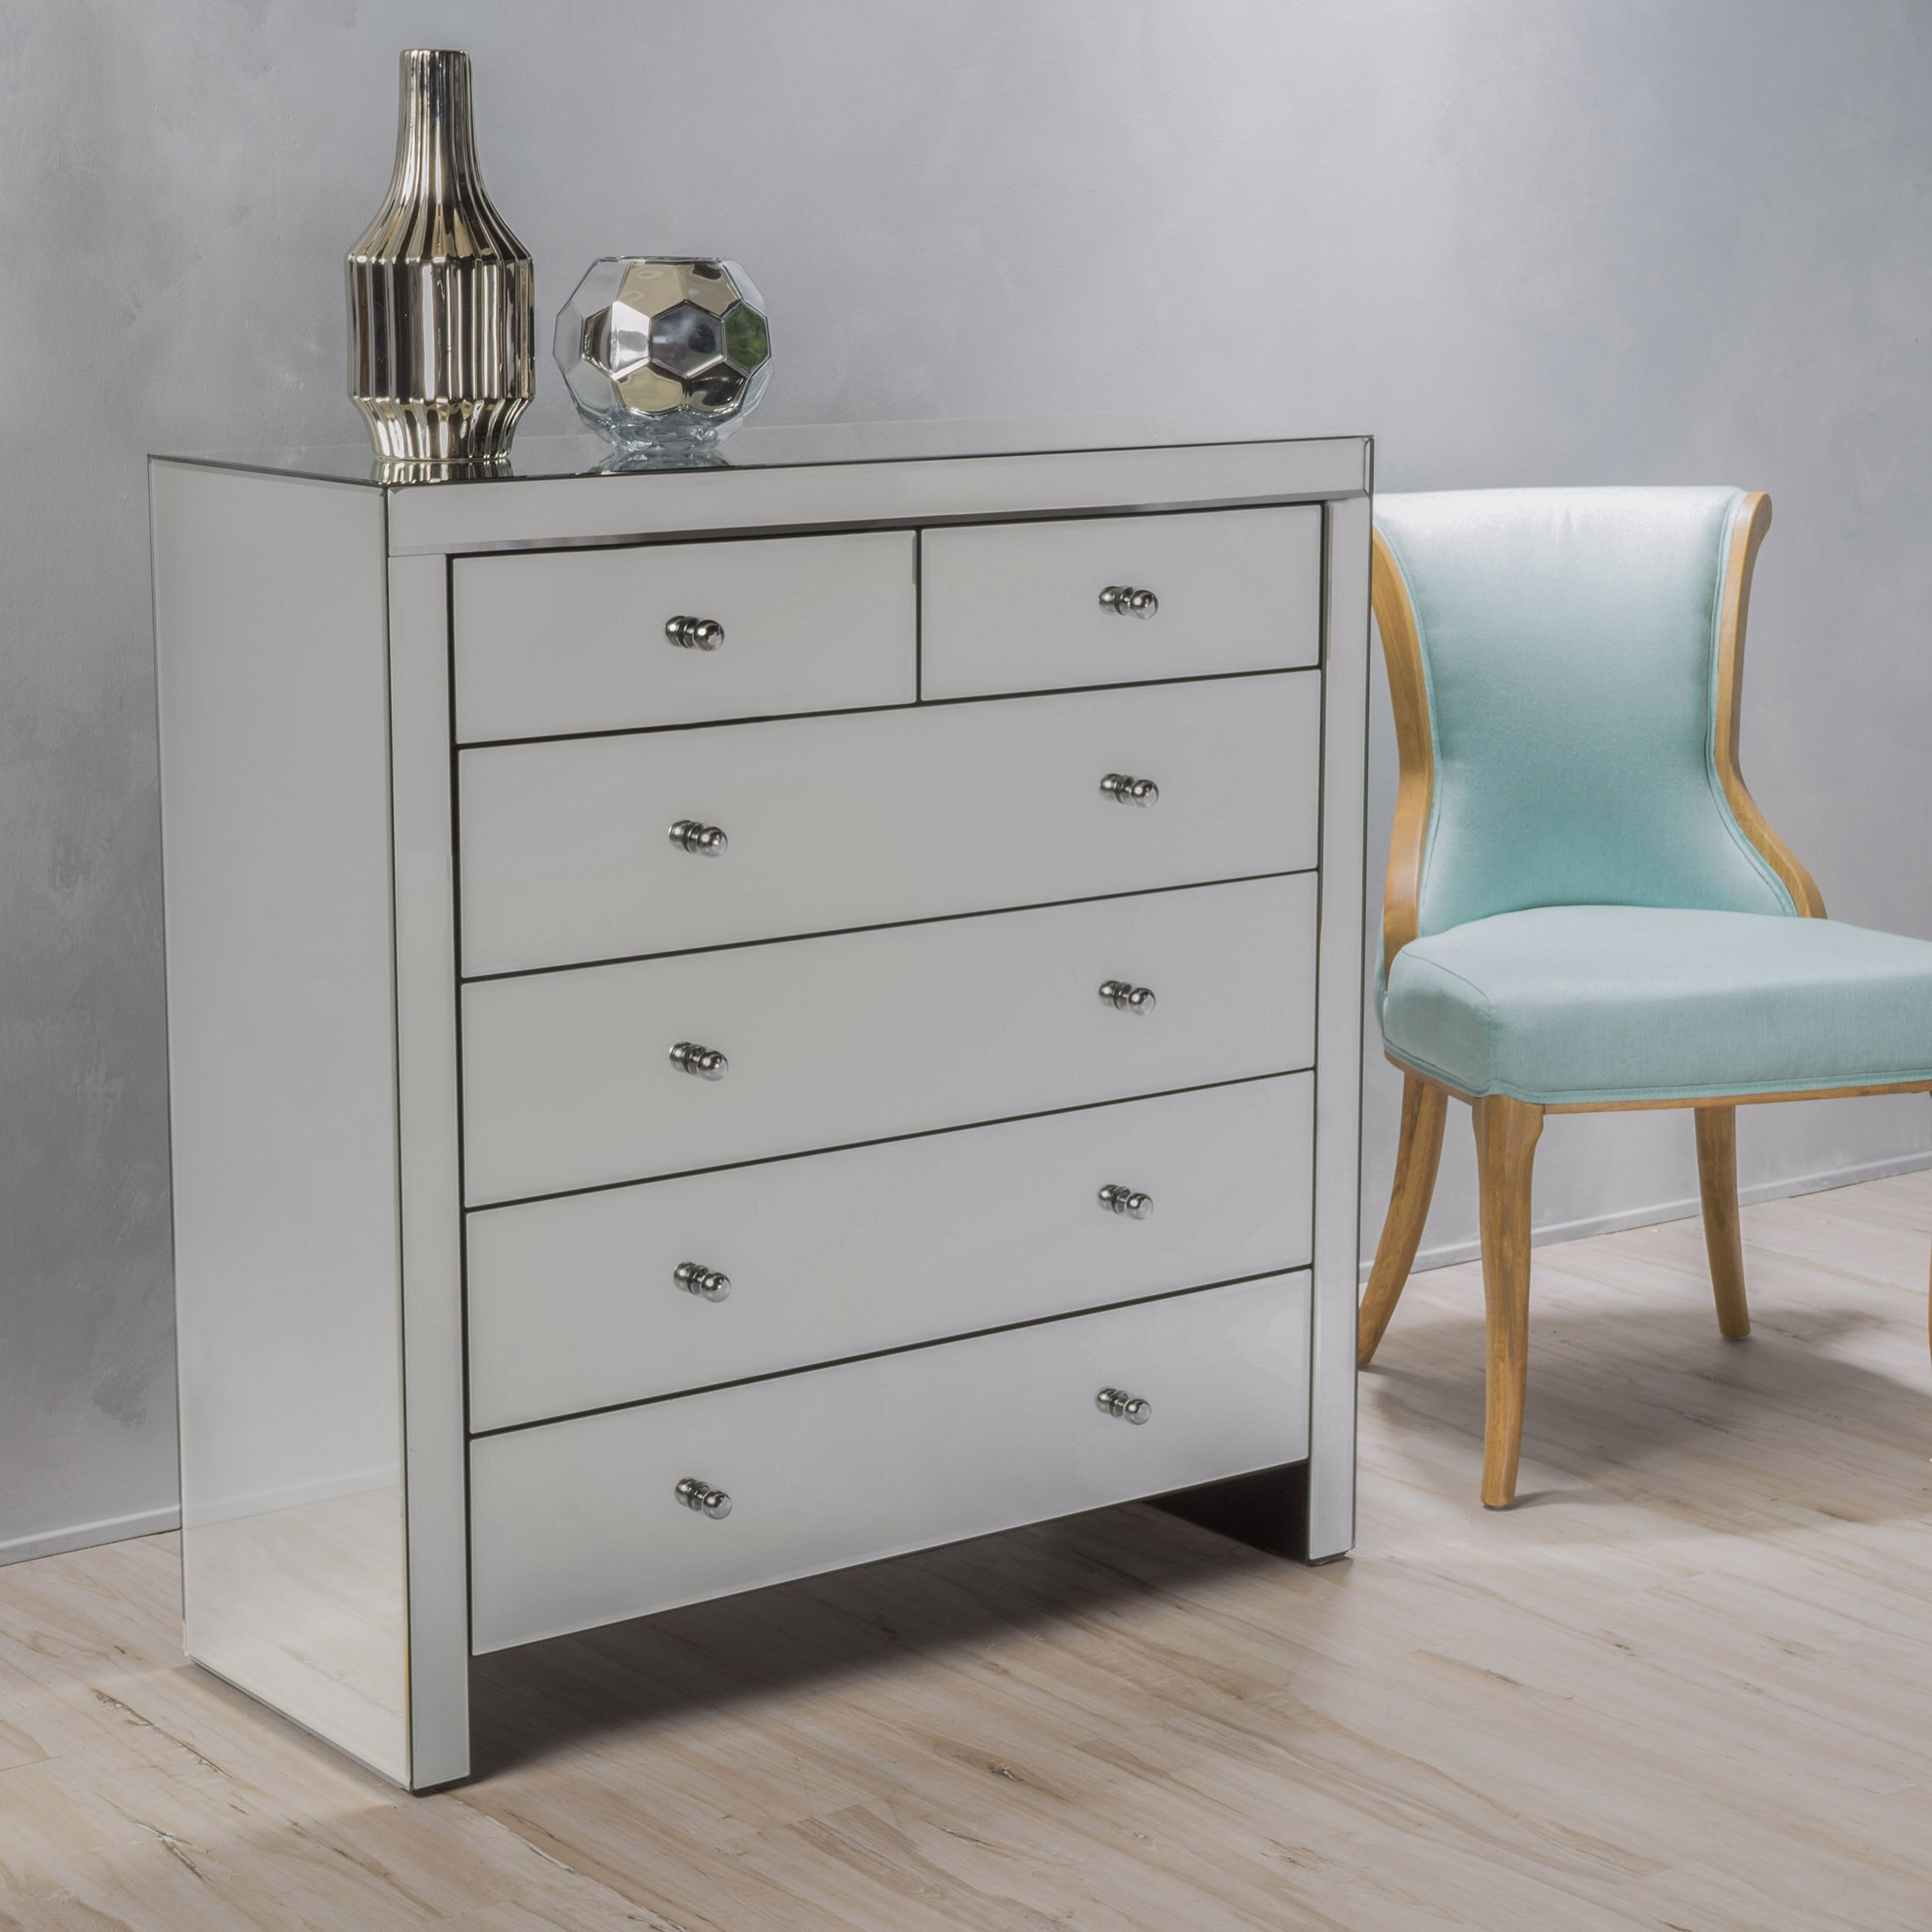 house of hampton ralston 6 drawer mirrored chest wayfair. Black Bedroom Furniture Sets. Home Design Ideas